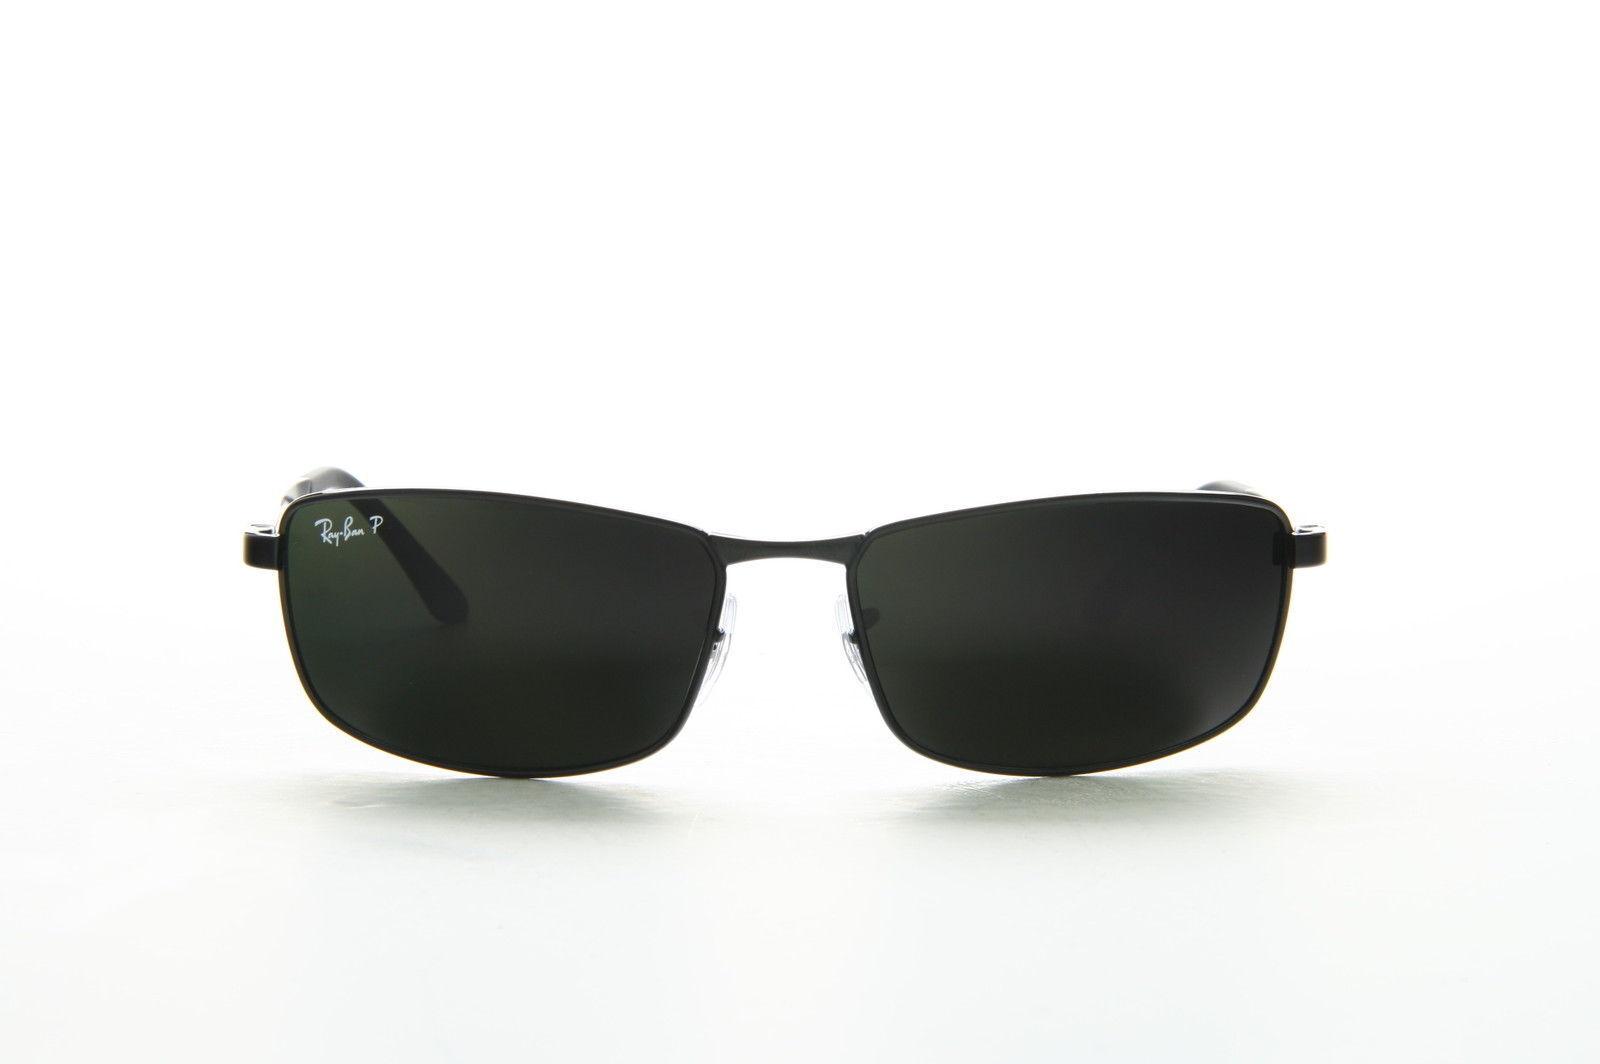 c0cf617ecfa Ray-Ban RB3498 002 9A Polarized Rectangular Sunglasses - Black ...